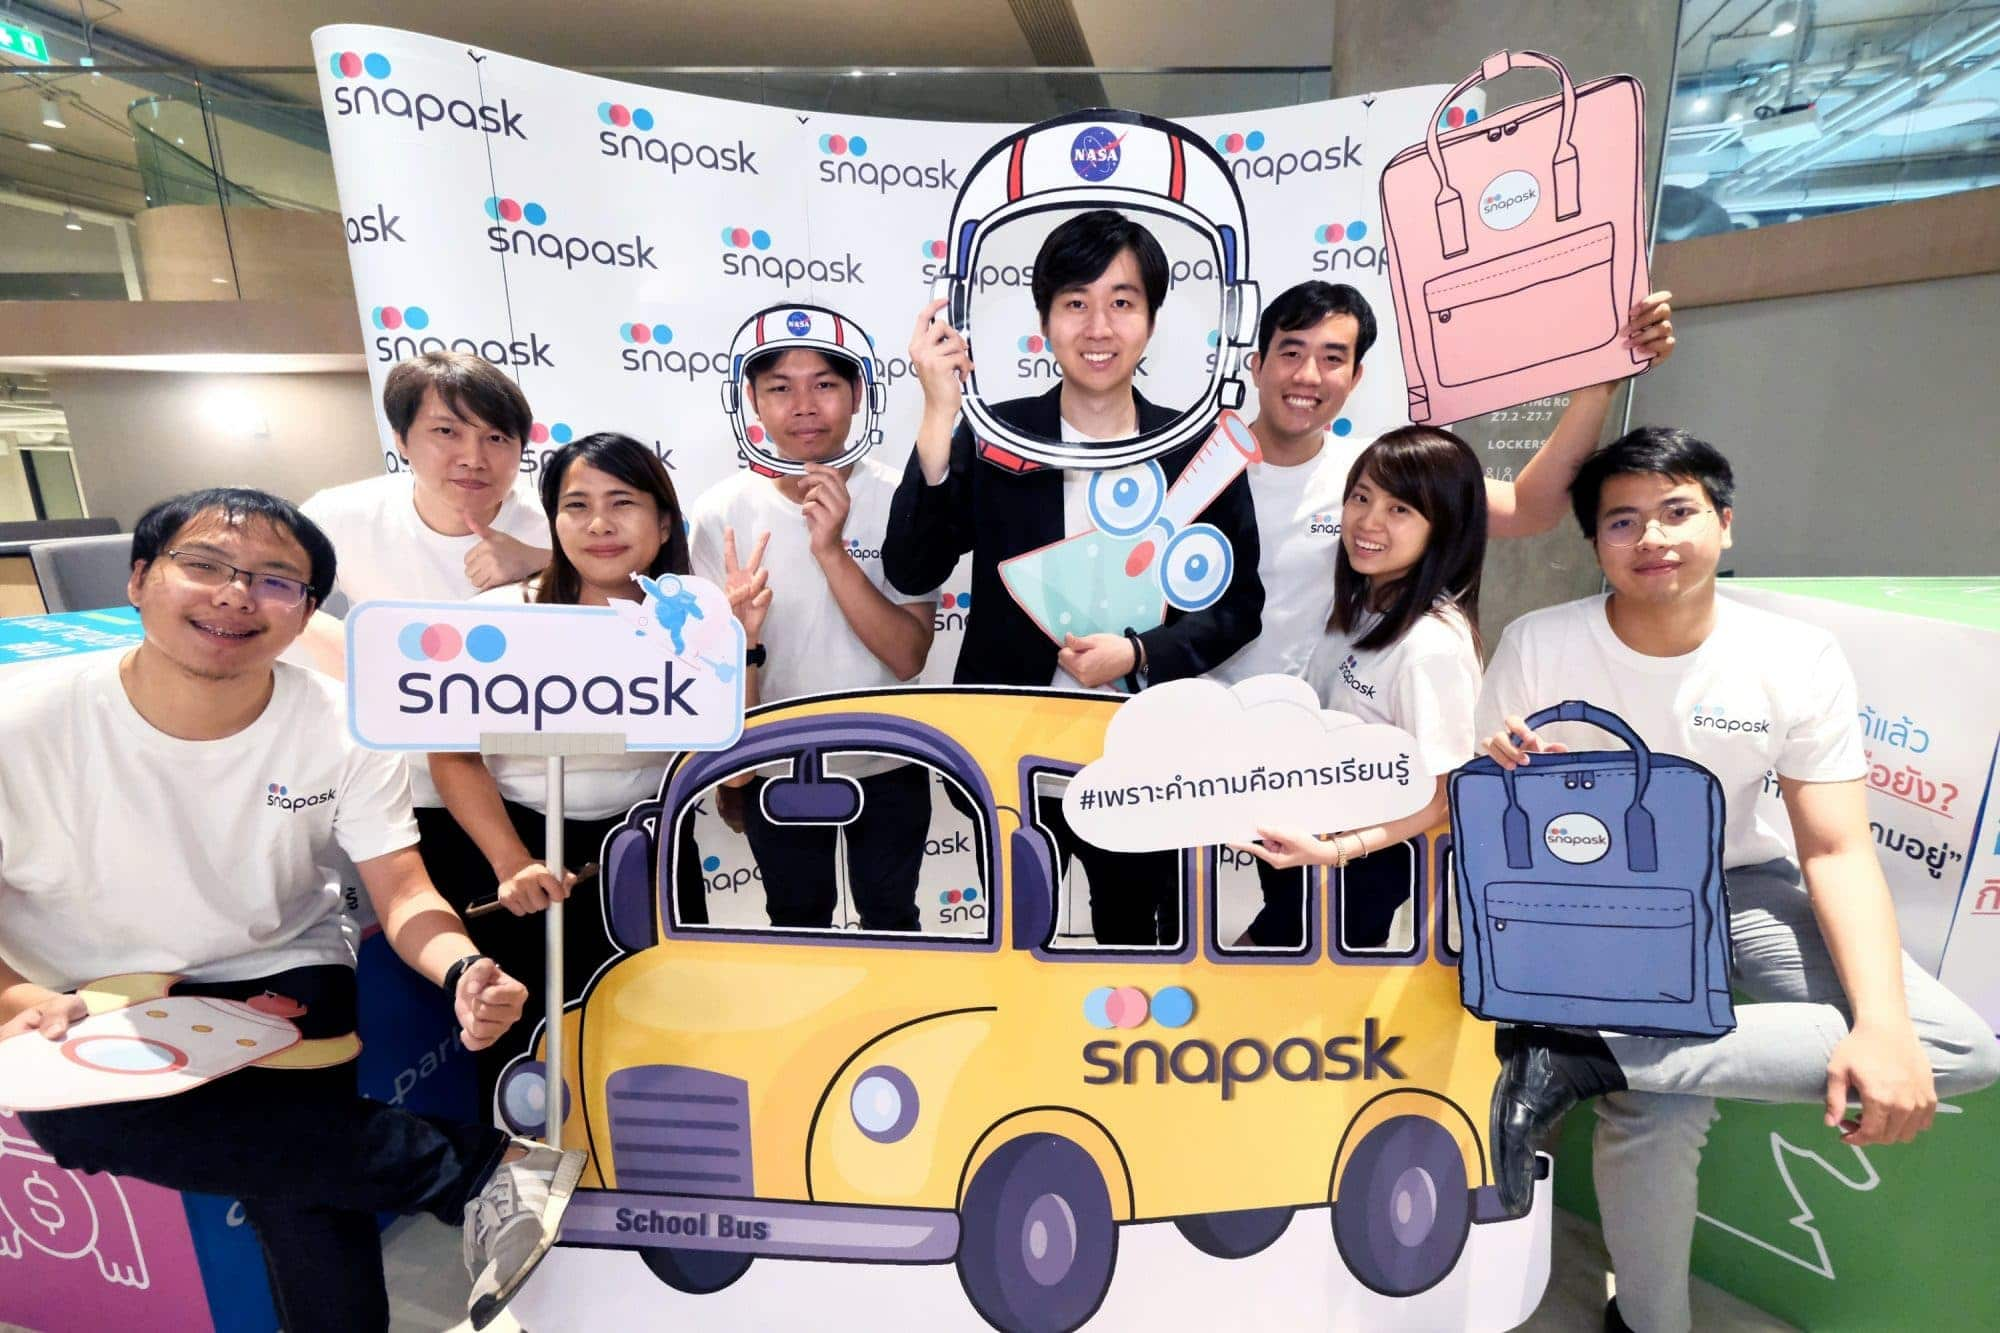 Snapask New Gen Dream เผย 3 ฟีเจอร์ใหม่ เพื่อเด็กรักเรียน 5